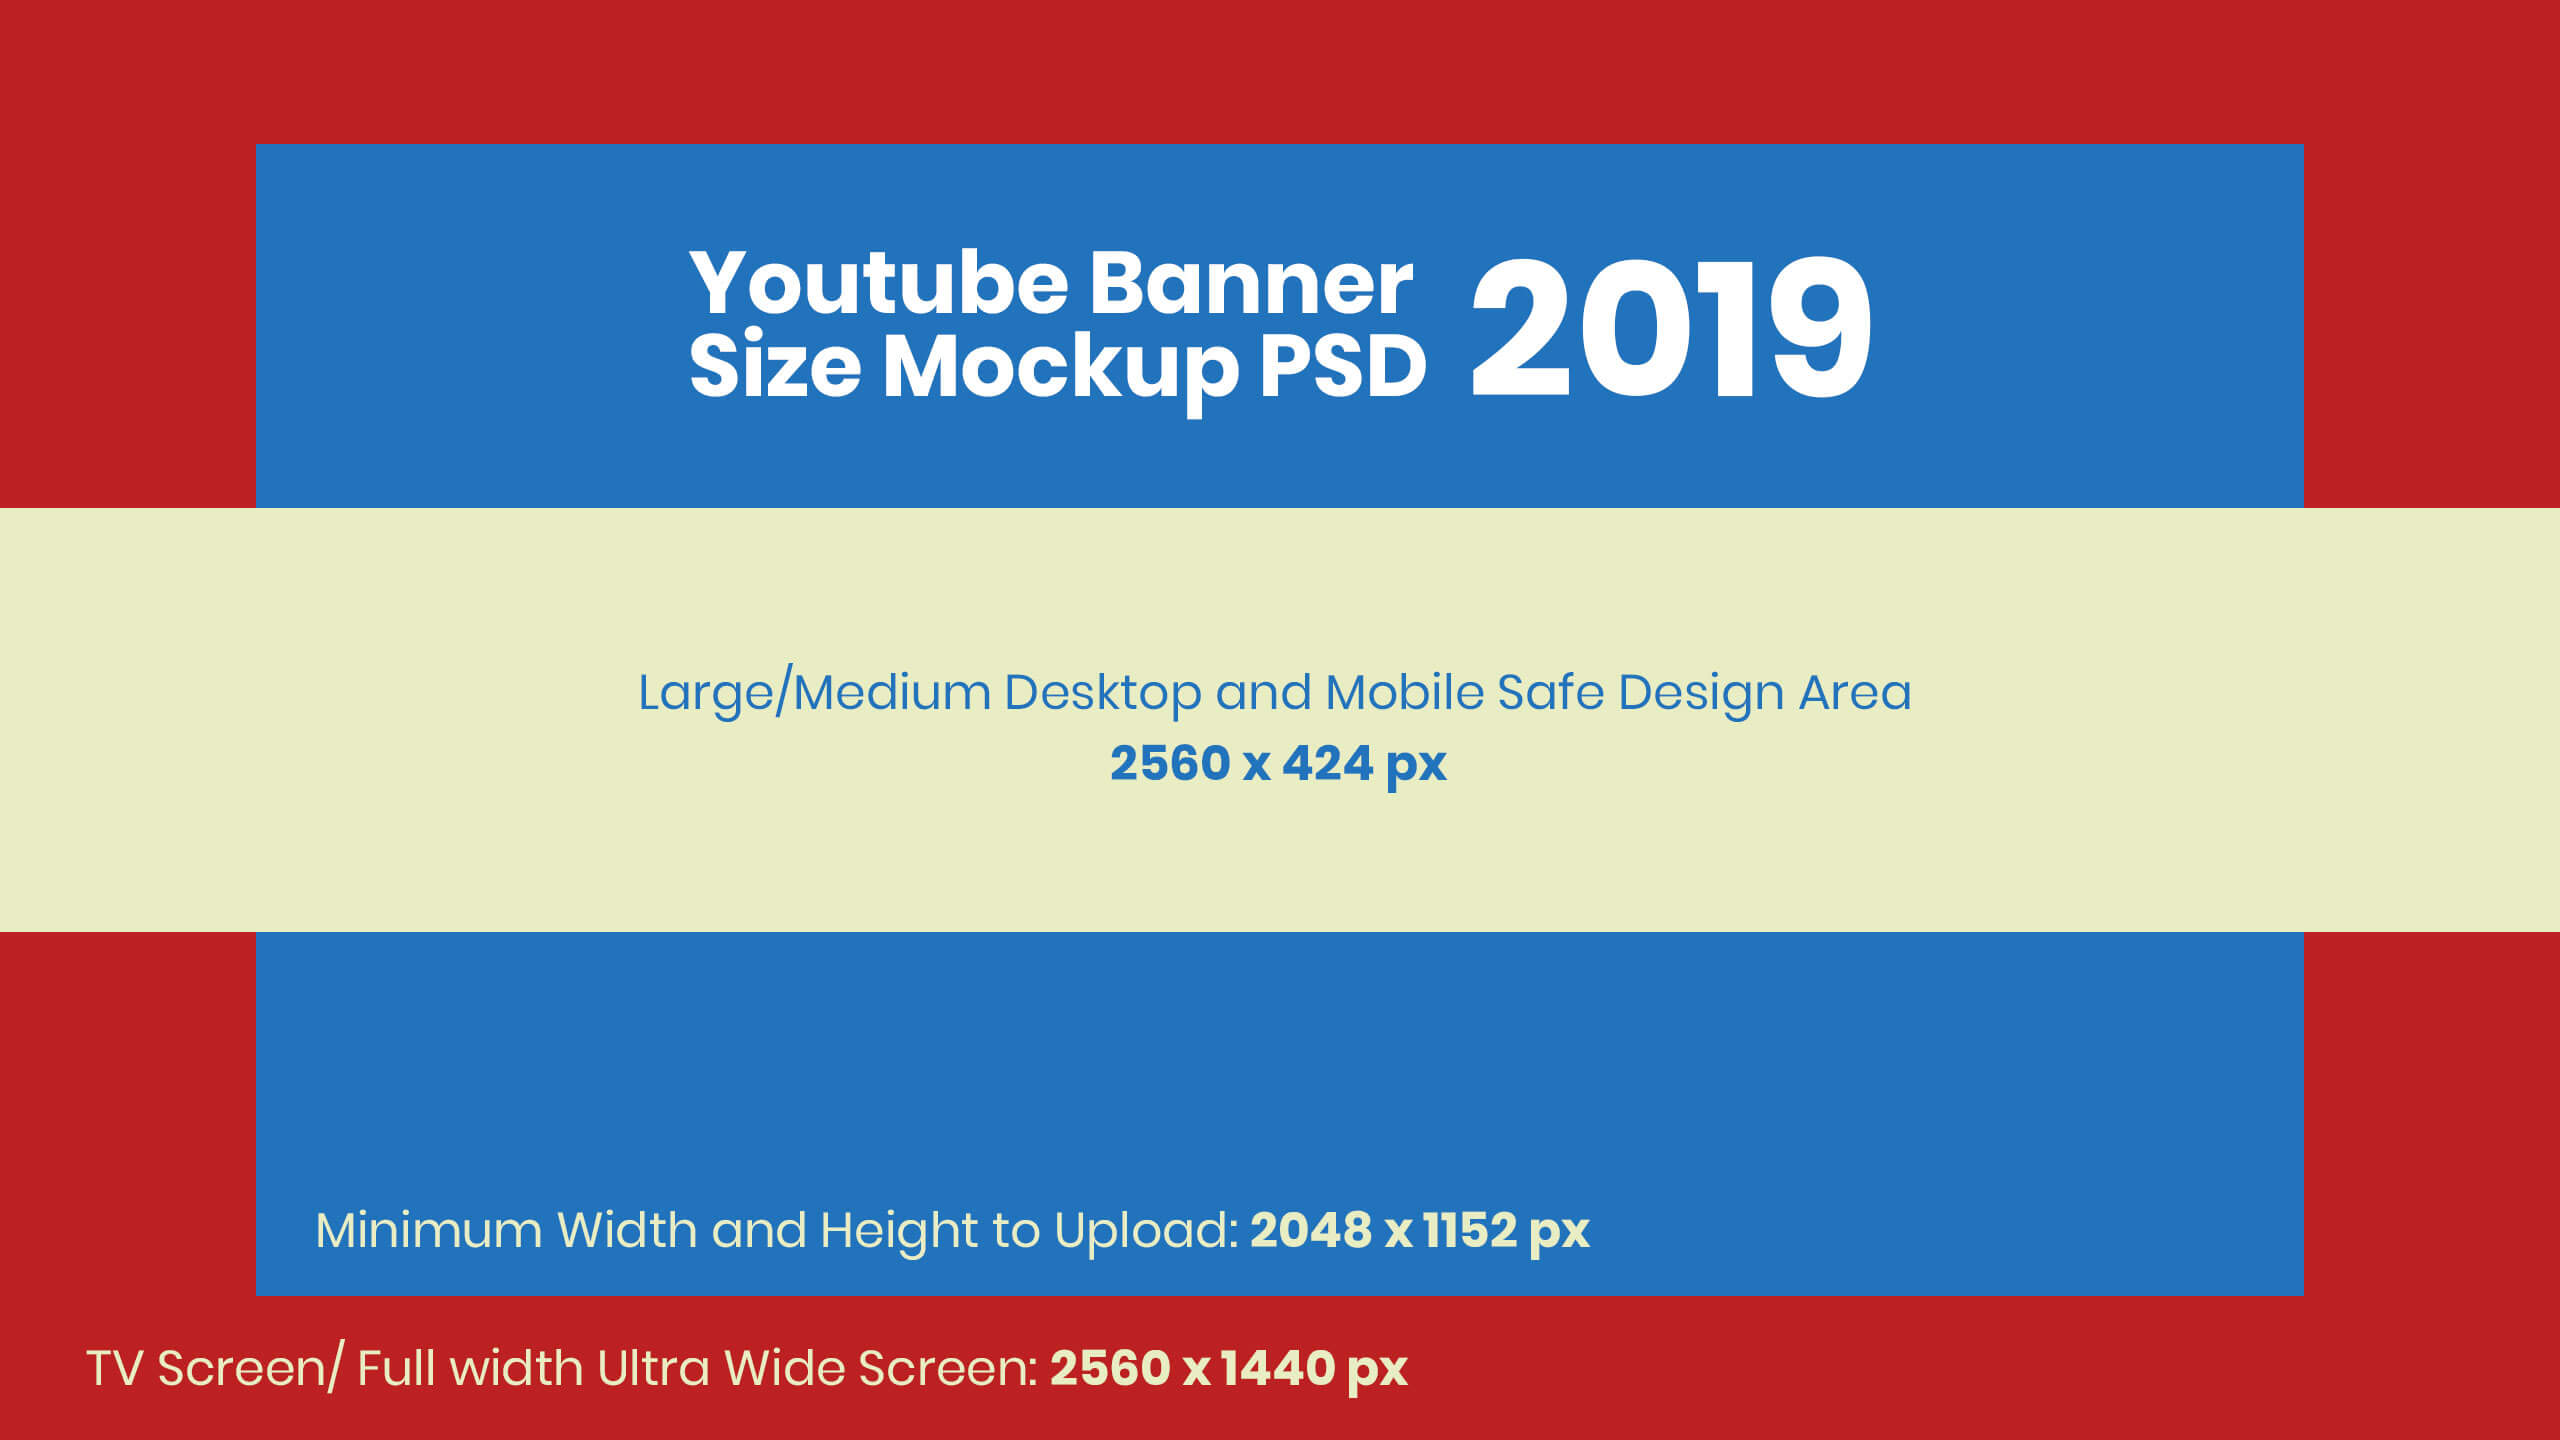 Free Youtube Banner Size Mockup 2019 & Design Template Psd with regard to Youtube Banner Size Template